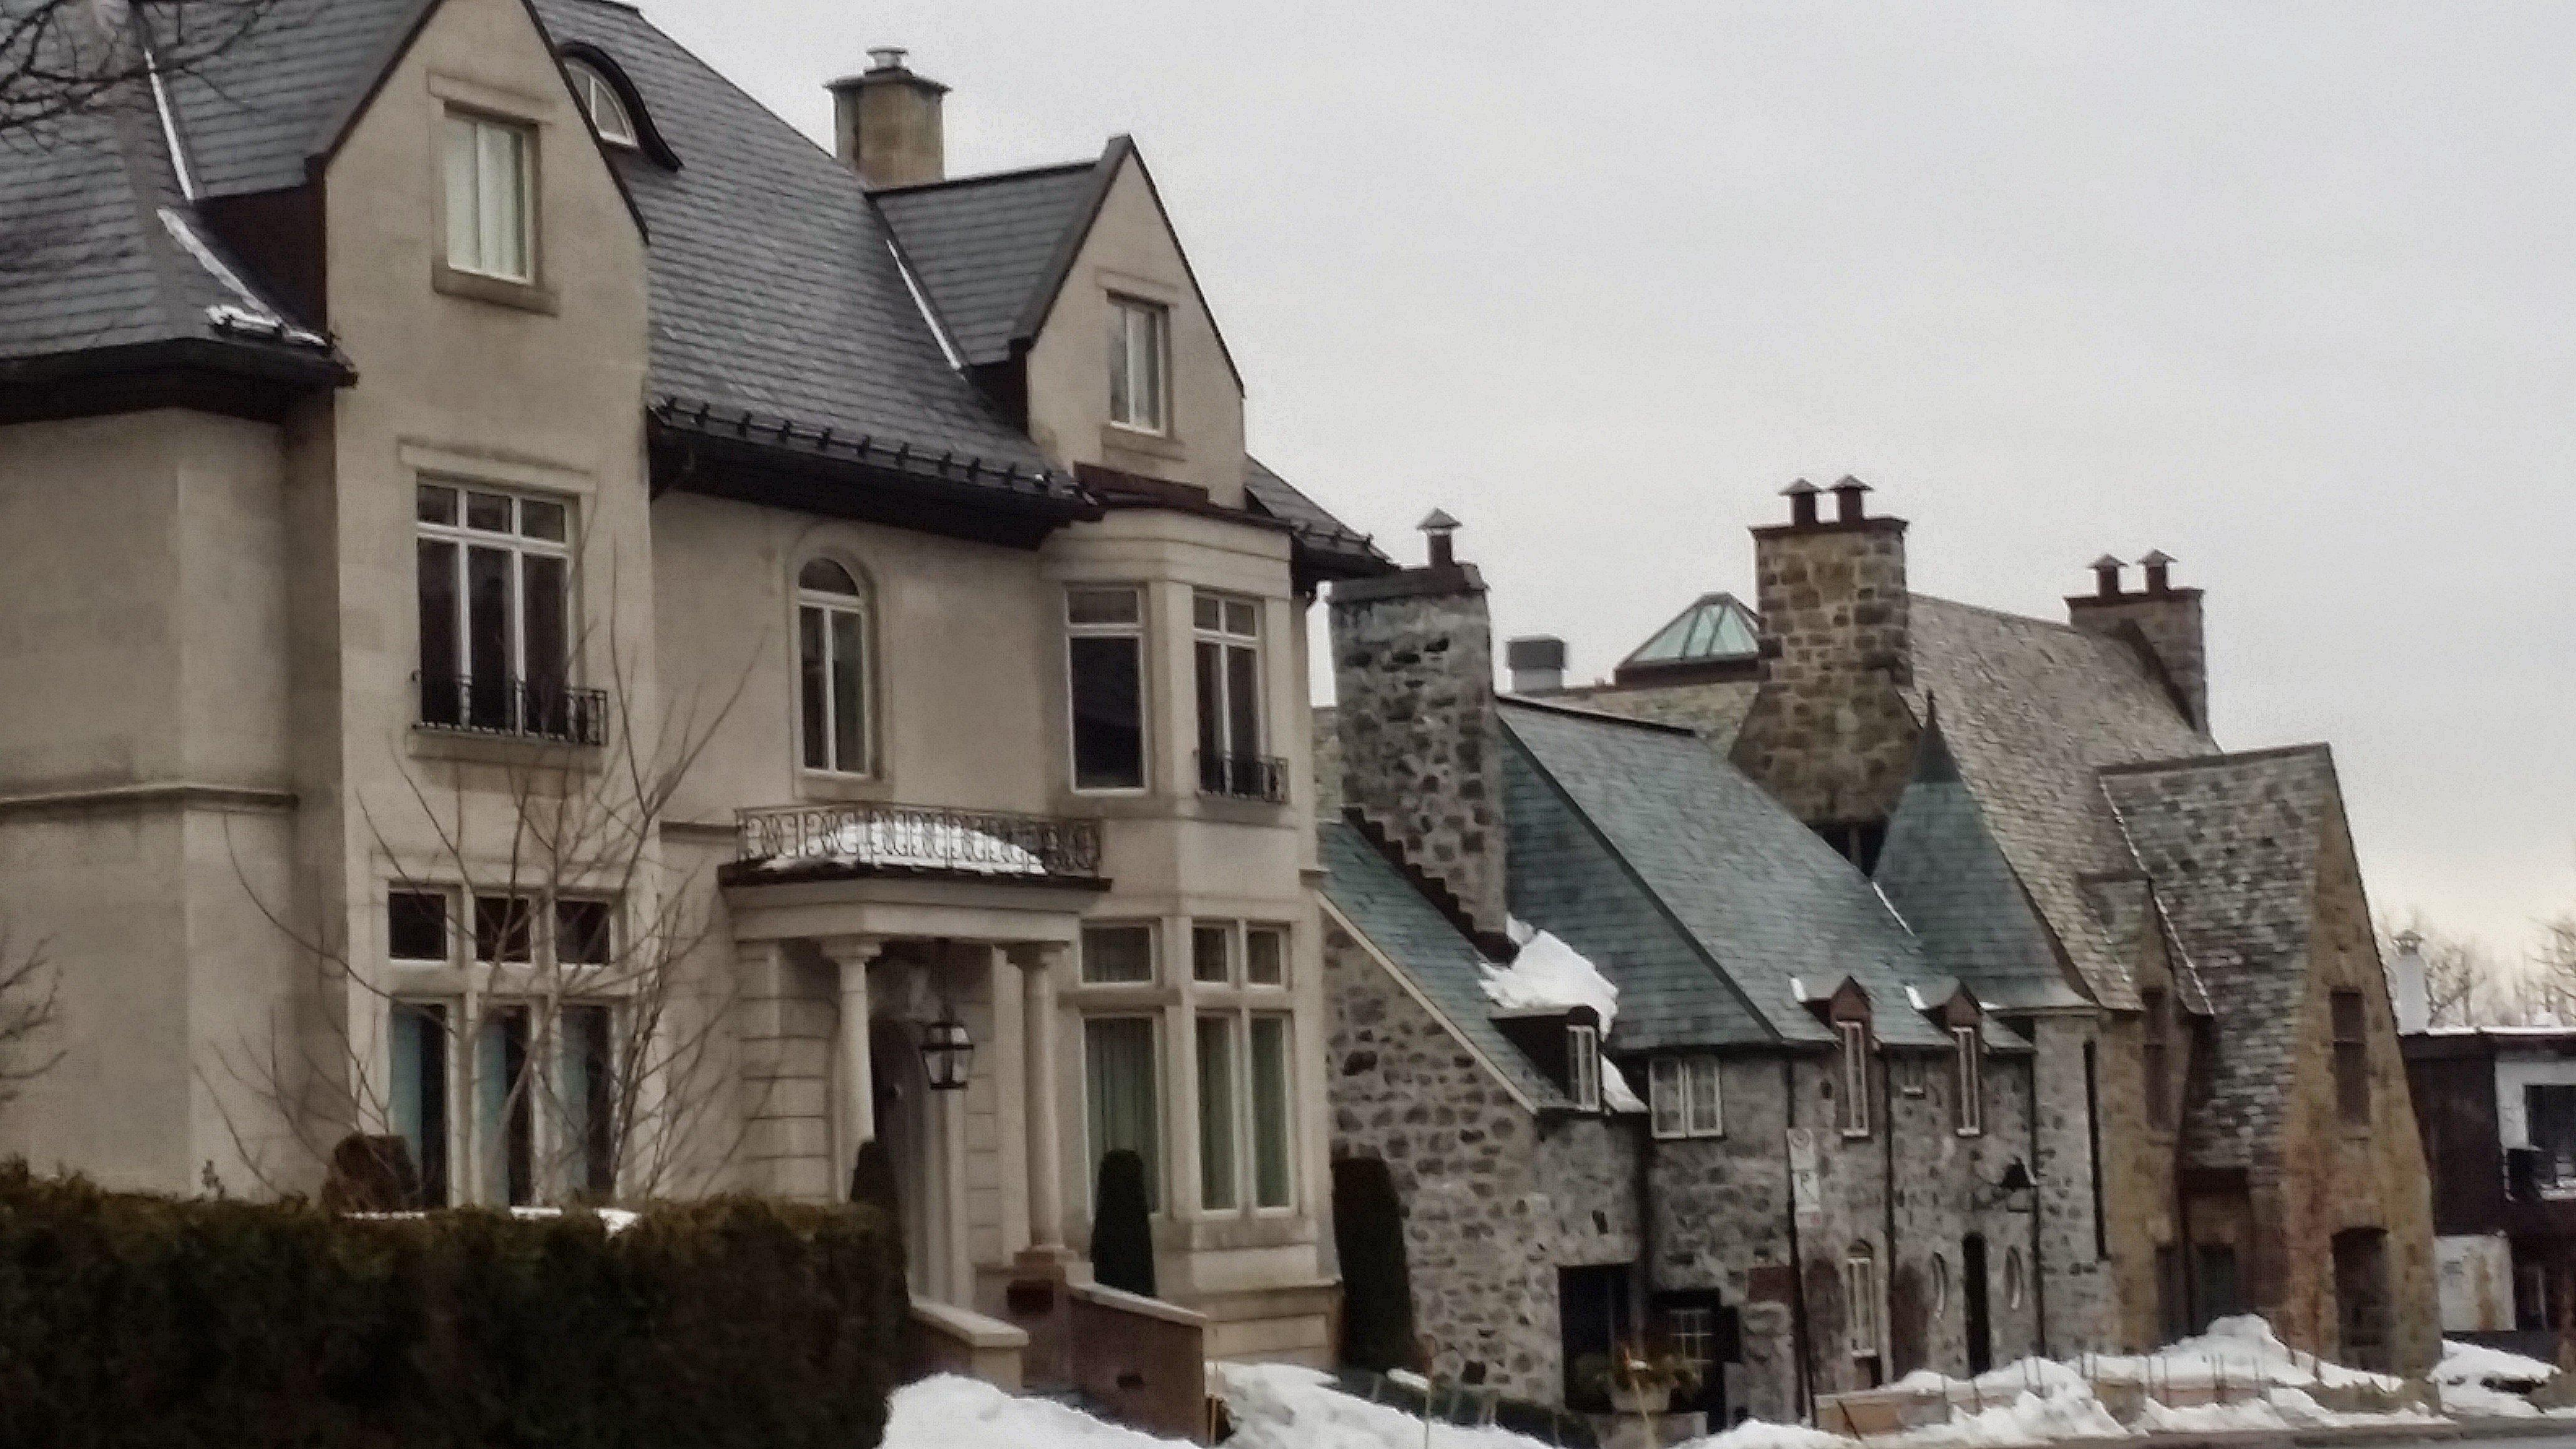 Montreal Real Estate & Neighborhoods